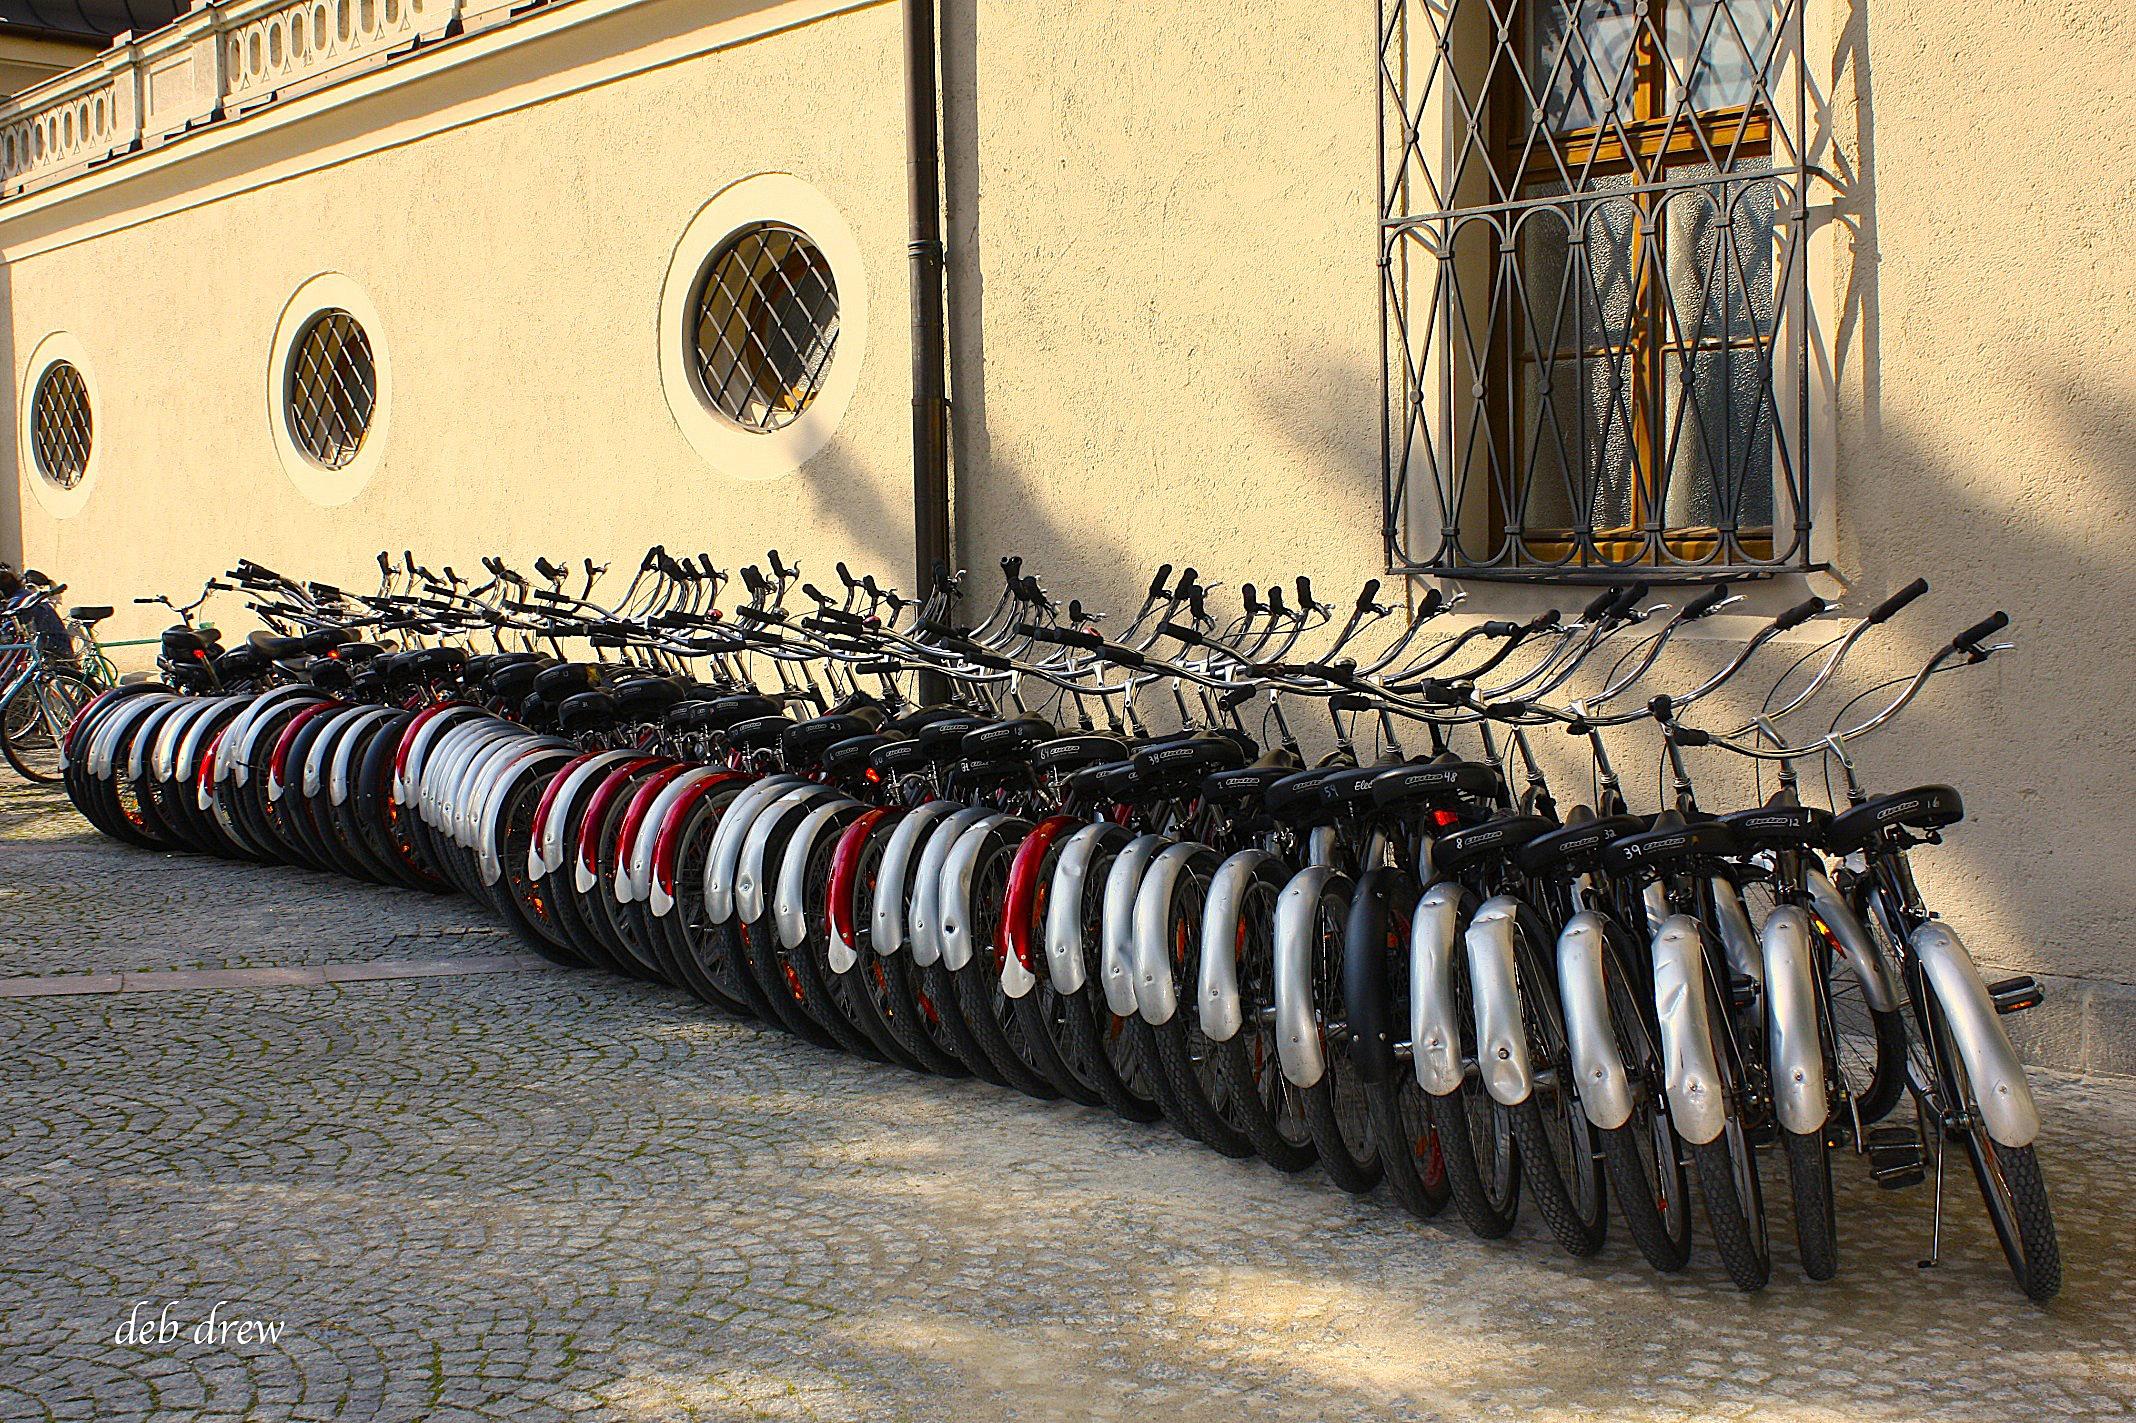 Germany Munich Bikes IMG_6658.JPG (1) 2.jpg